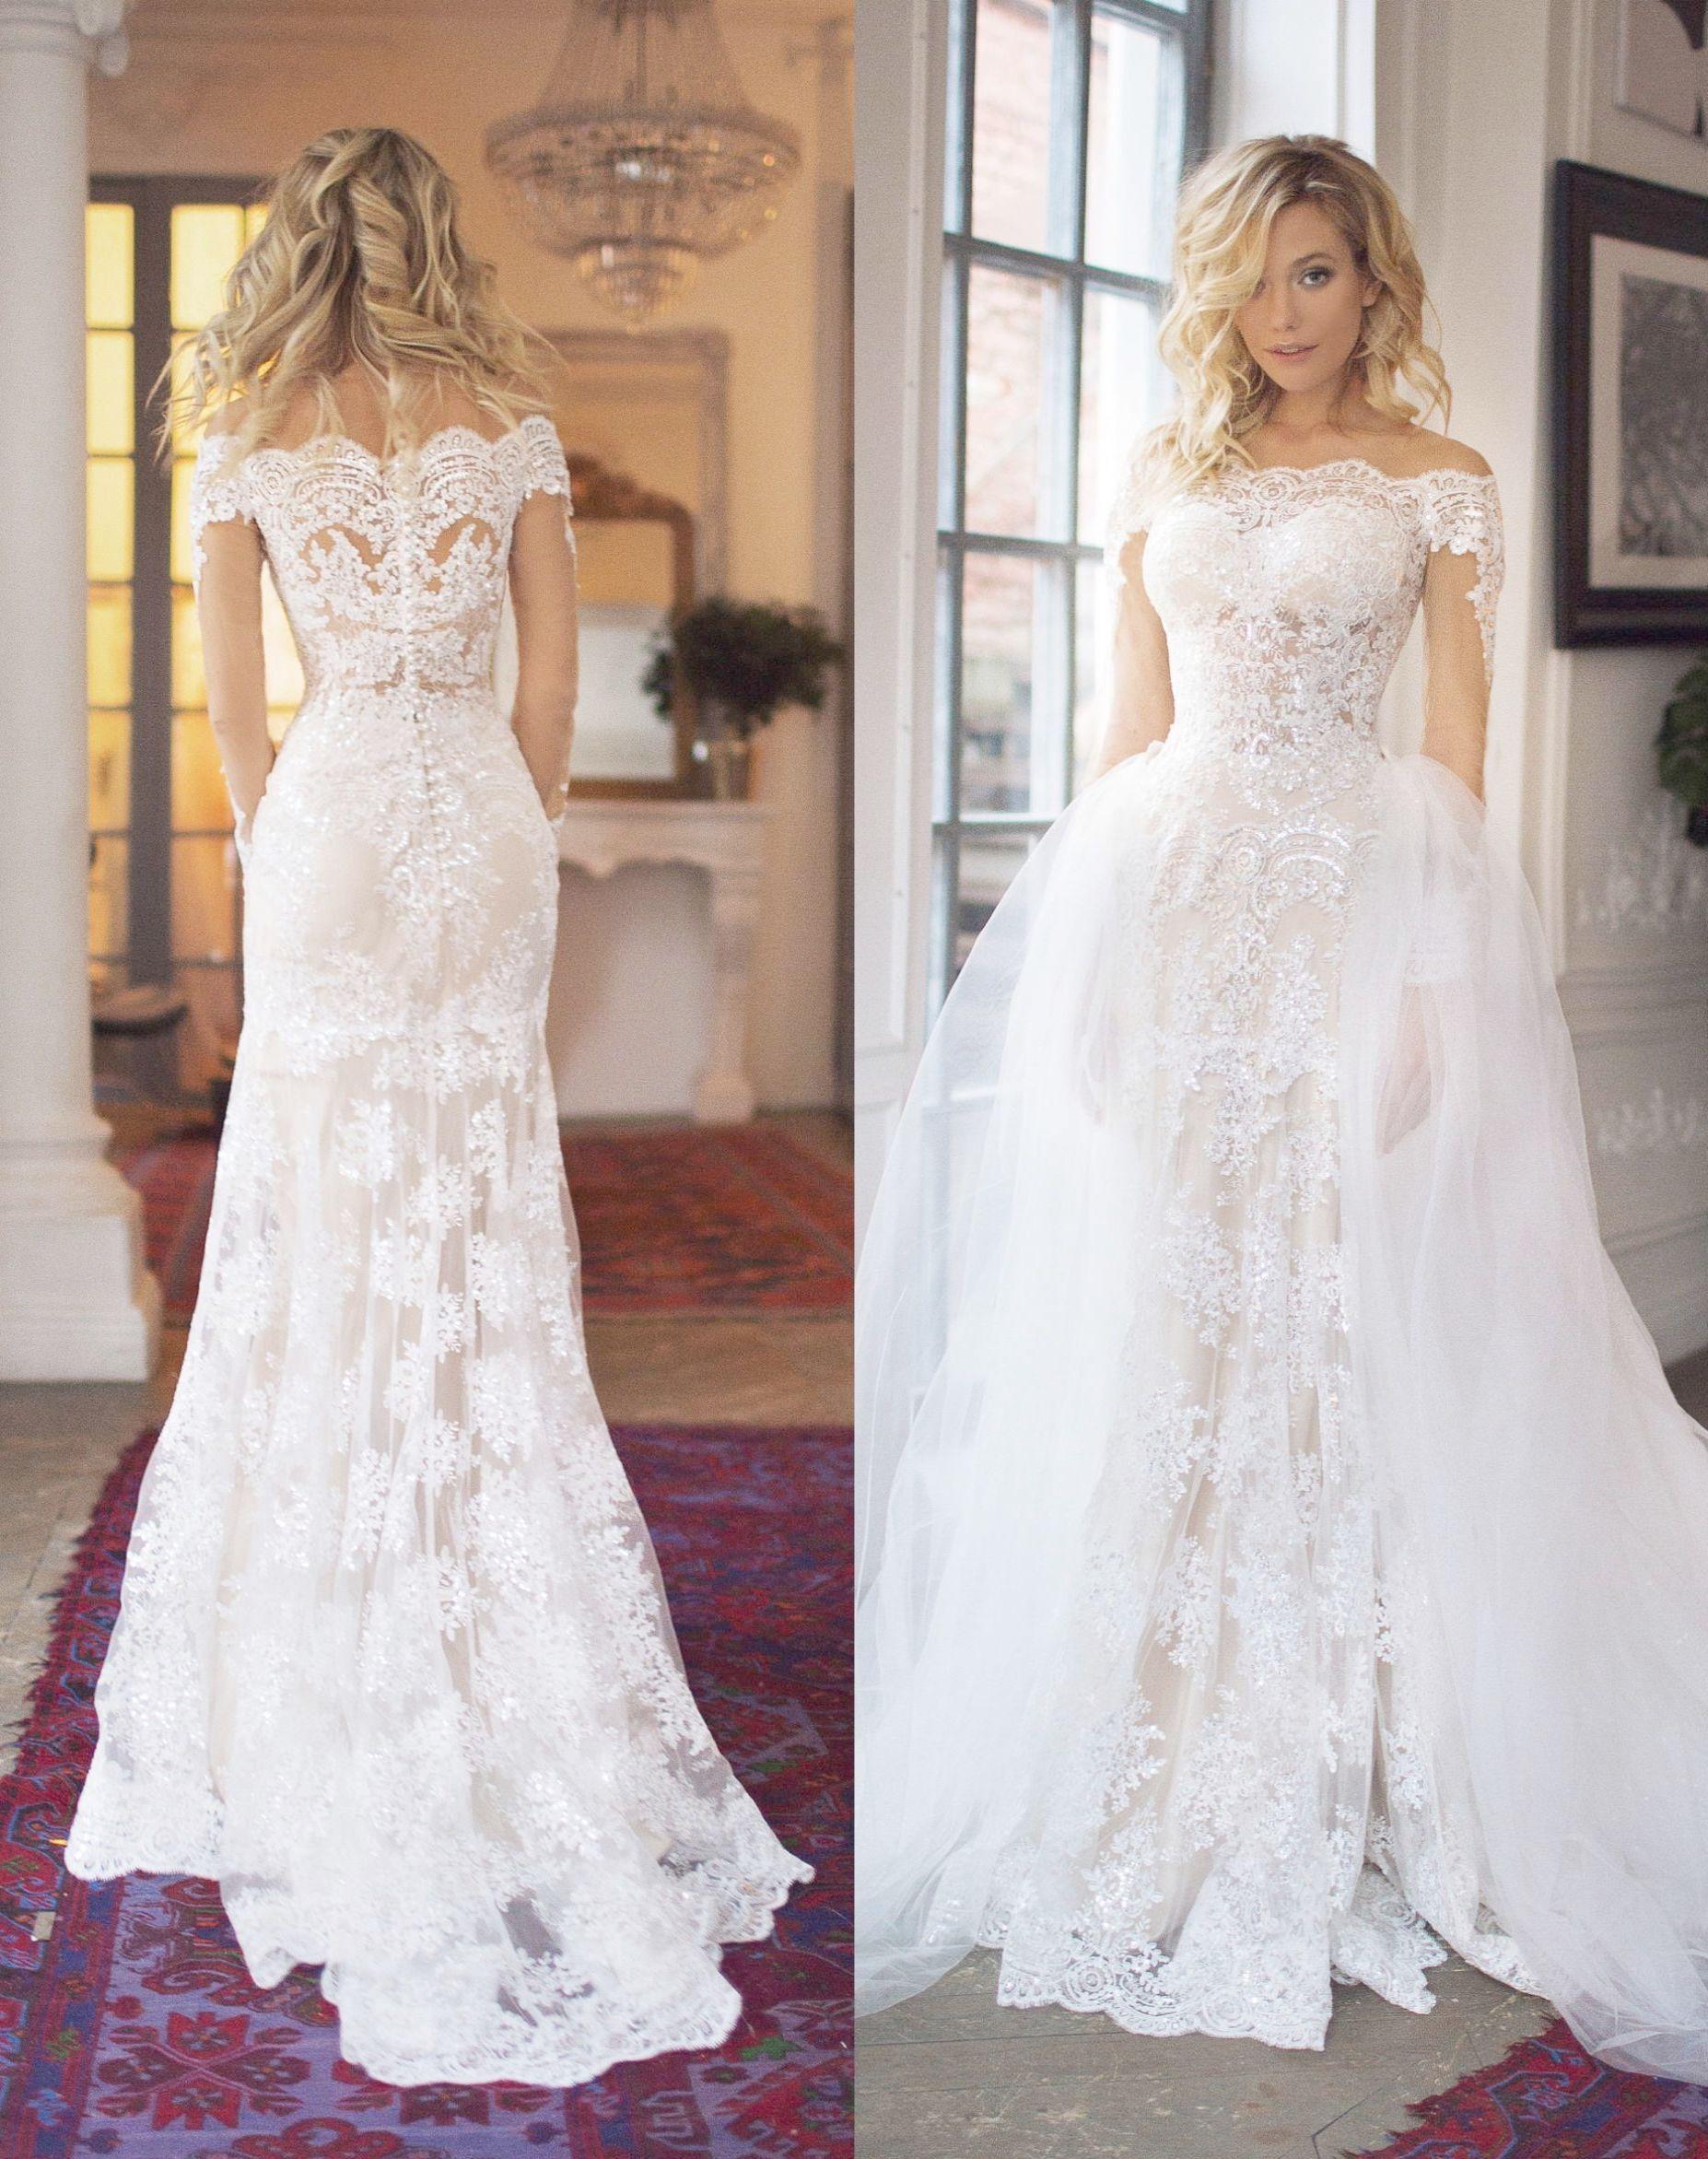 Lace Wedding Dresses Geelong Lace Wedding Dresses Near Me Wedding